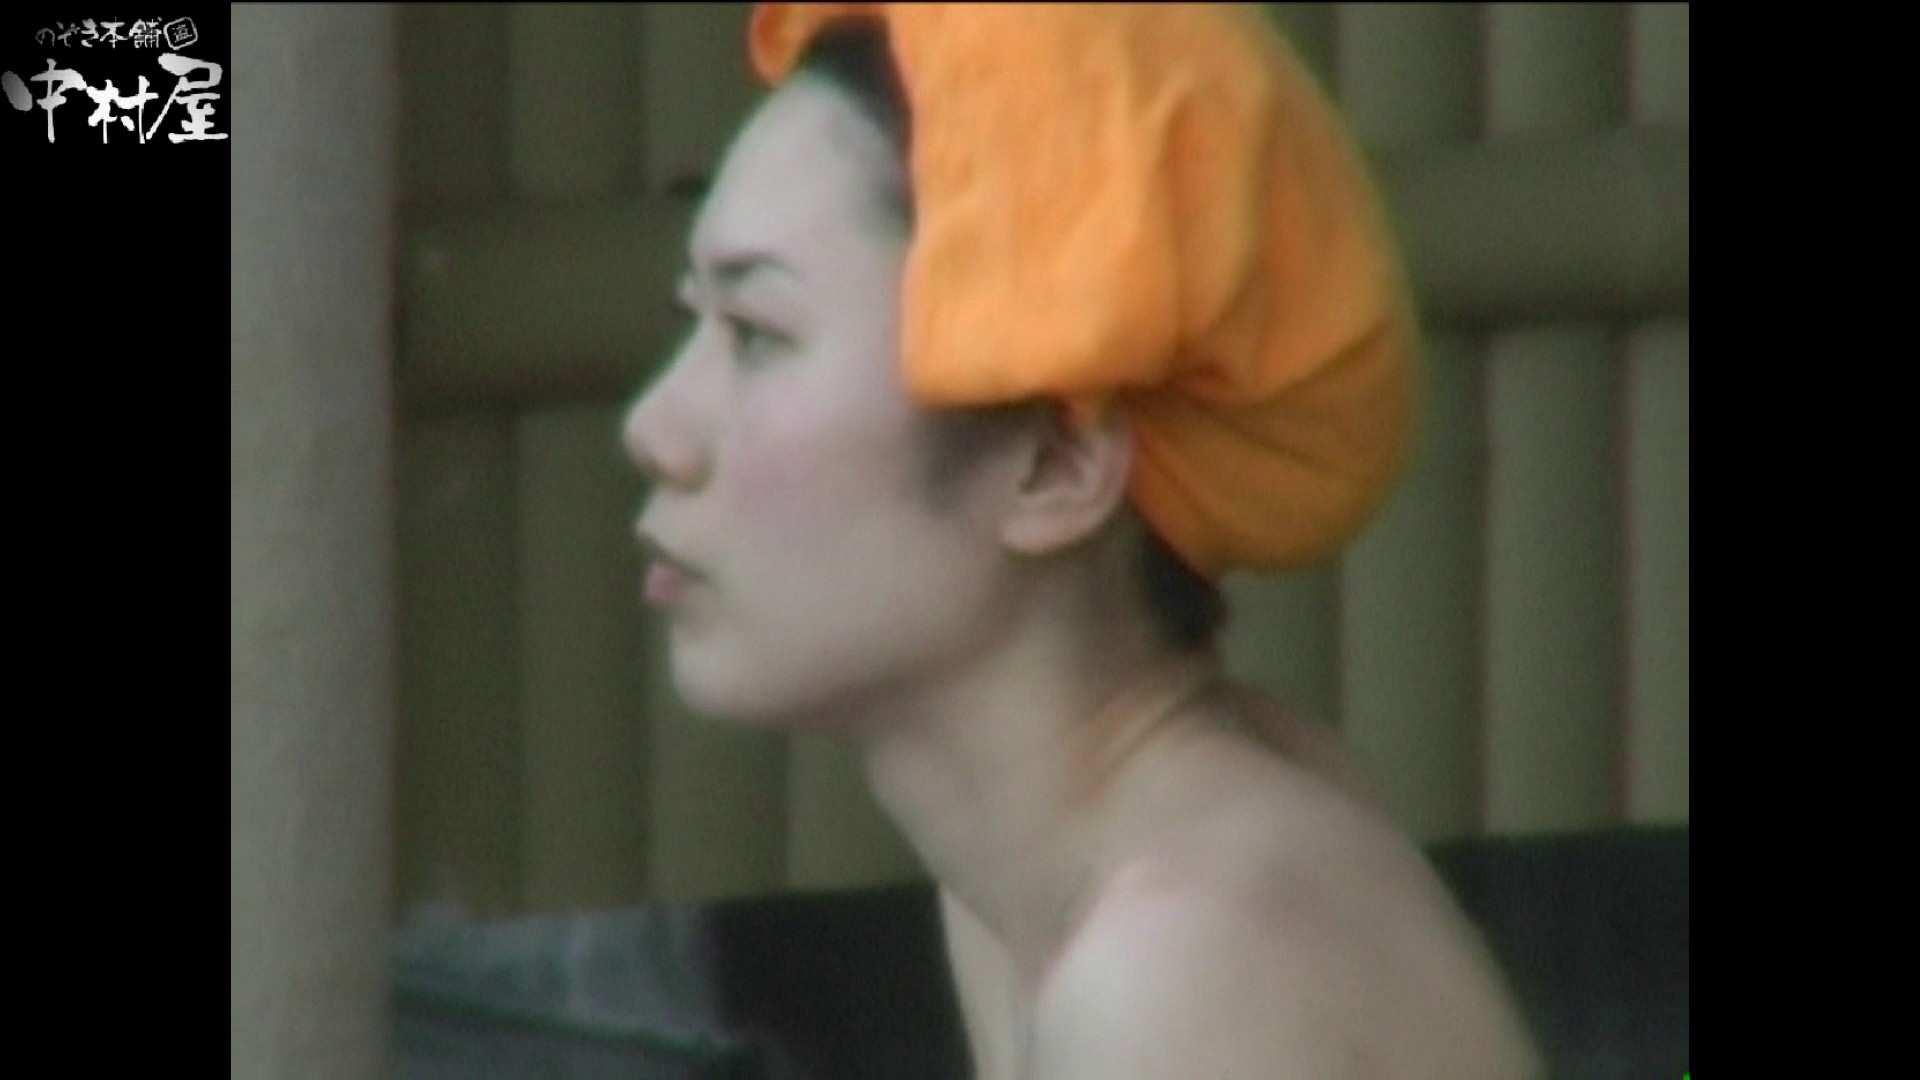 Aquaな露天風呂Vol.978 OL女体  88連発 54